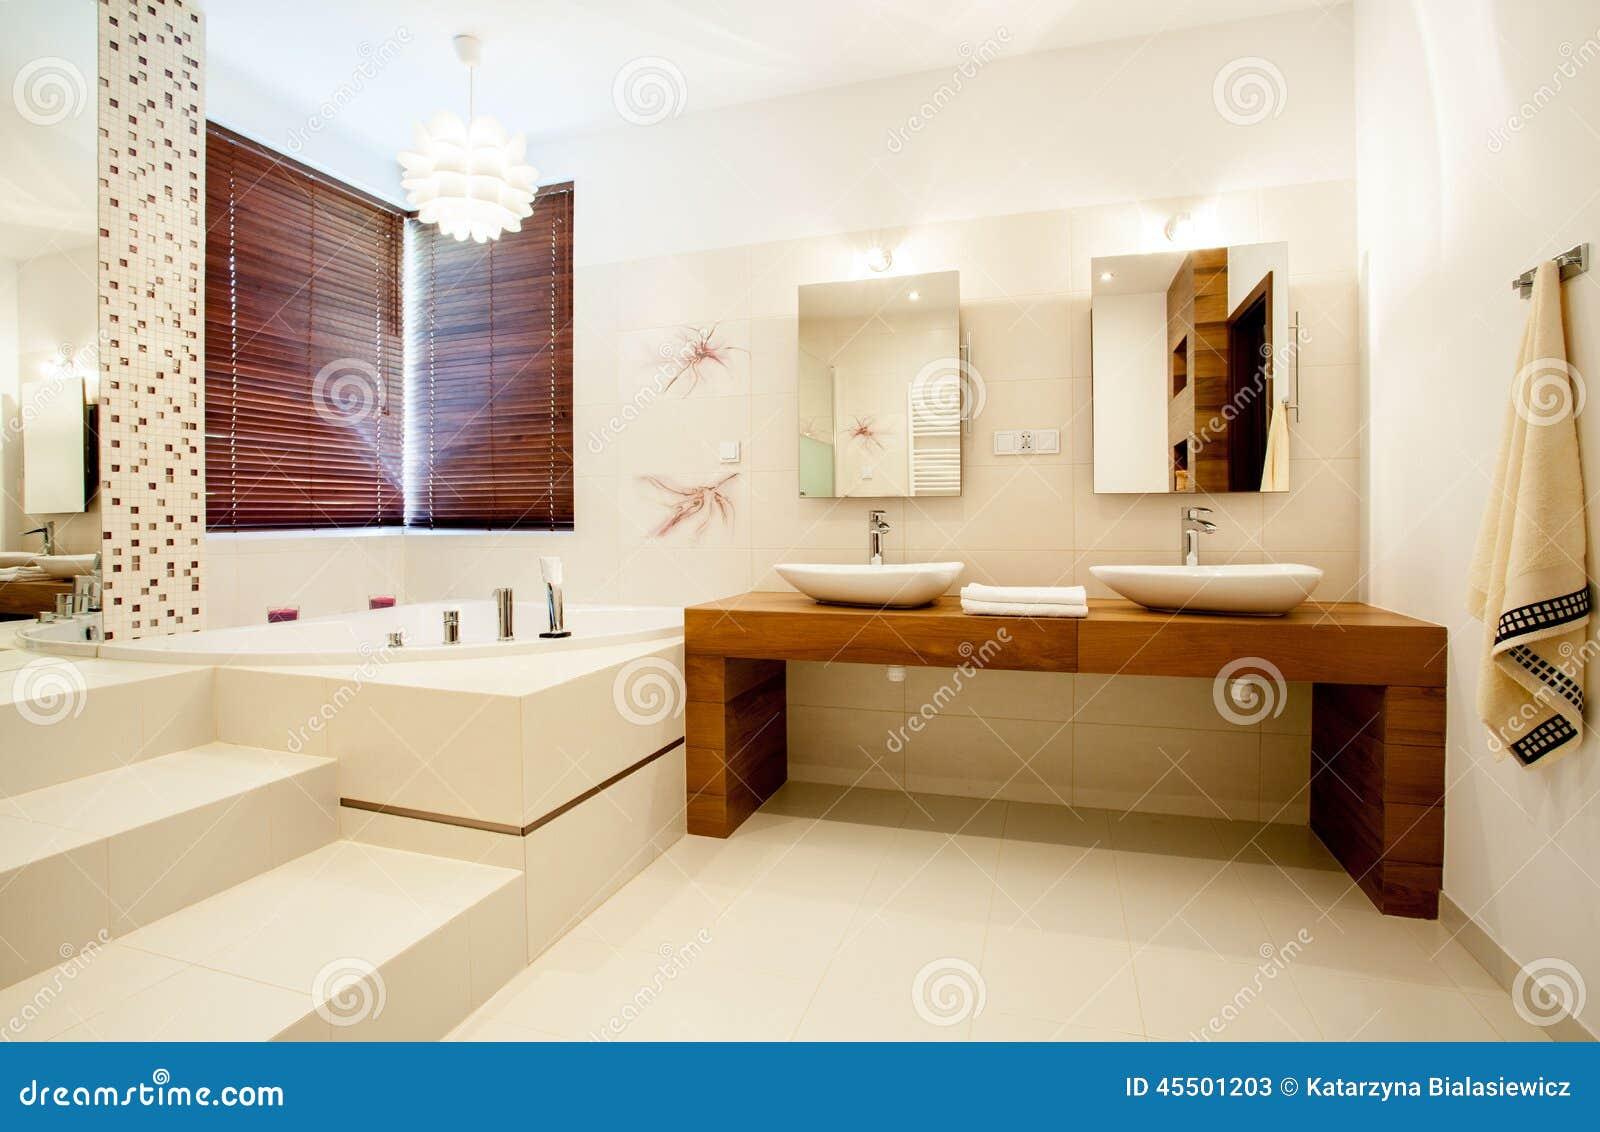 Casa Del Bagno: Arredamento la casa del bagno arredo. Come ...